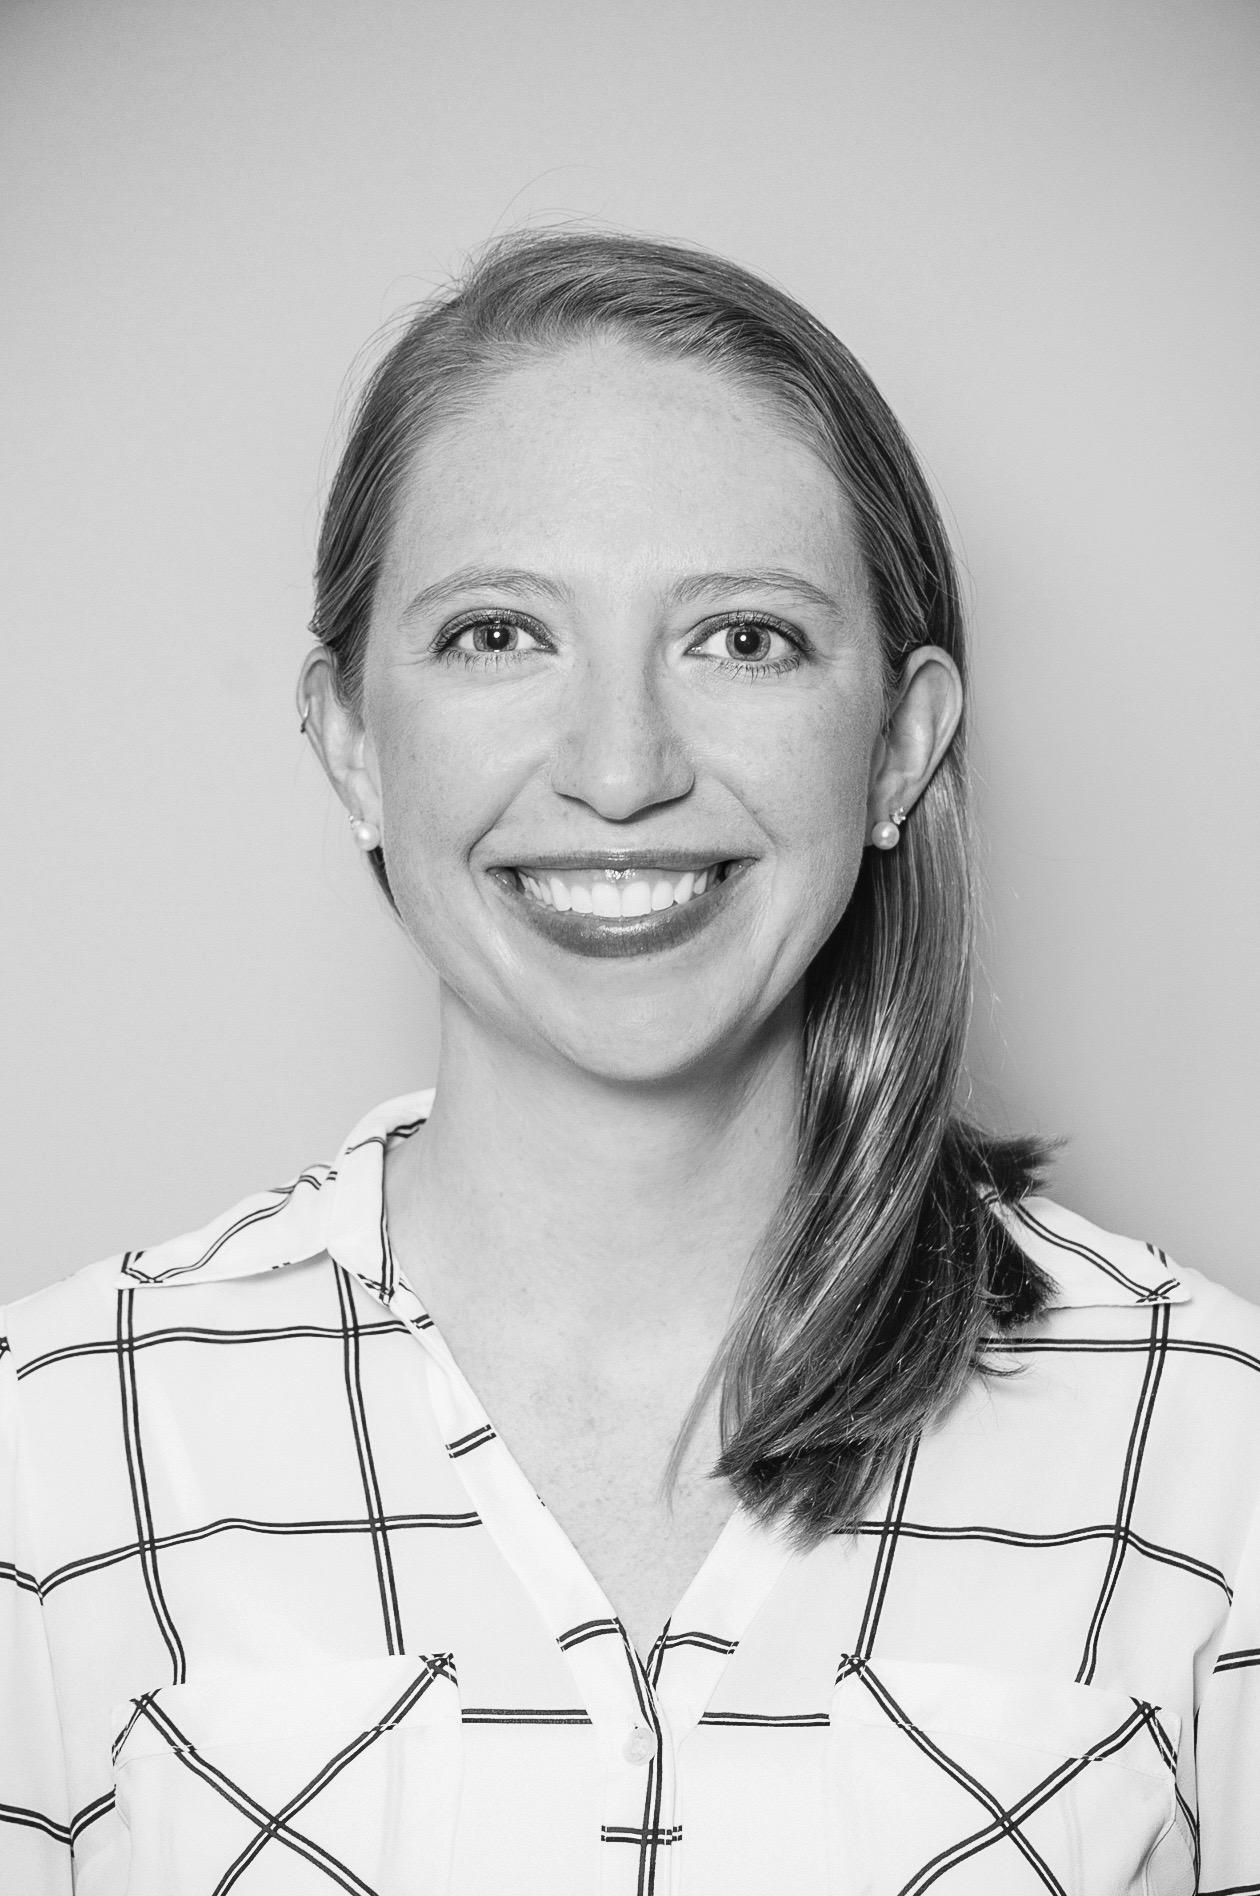 Kelsi Stine-Rowe